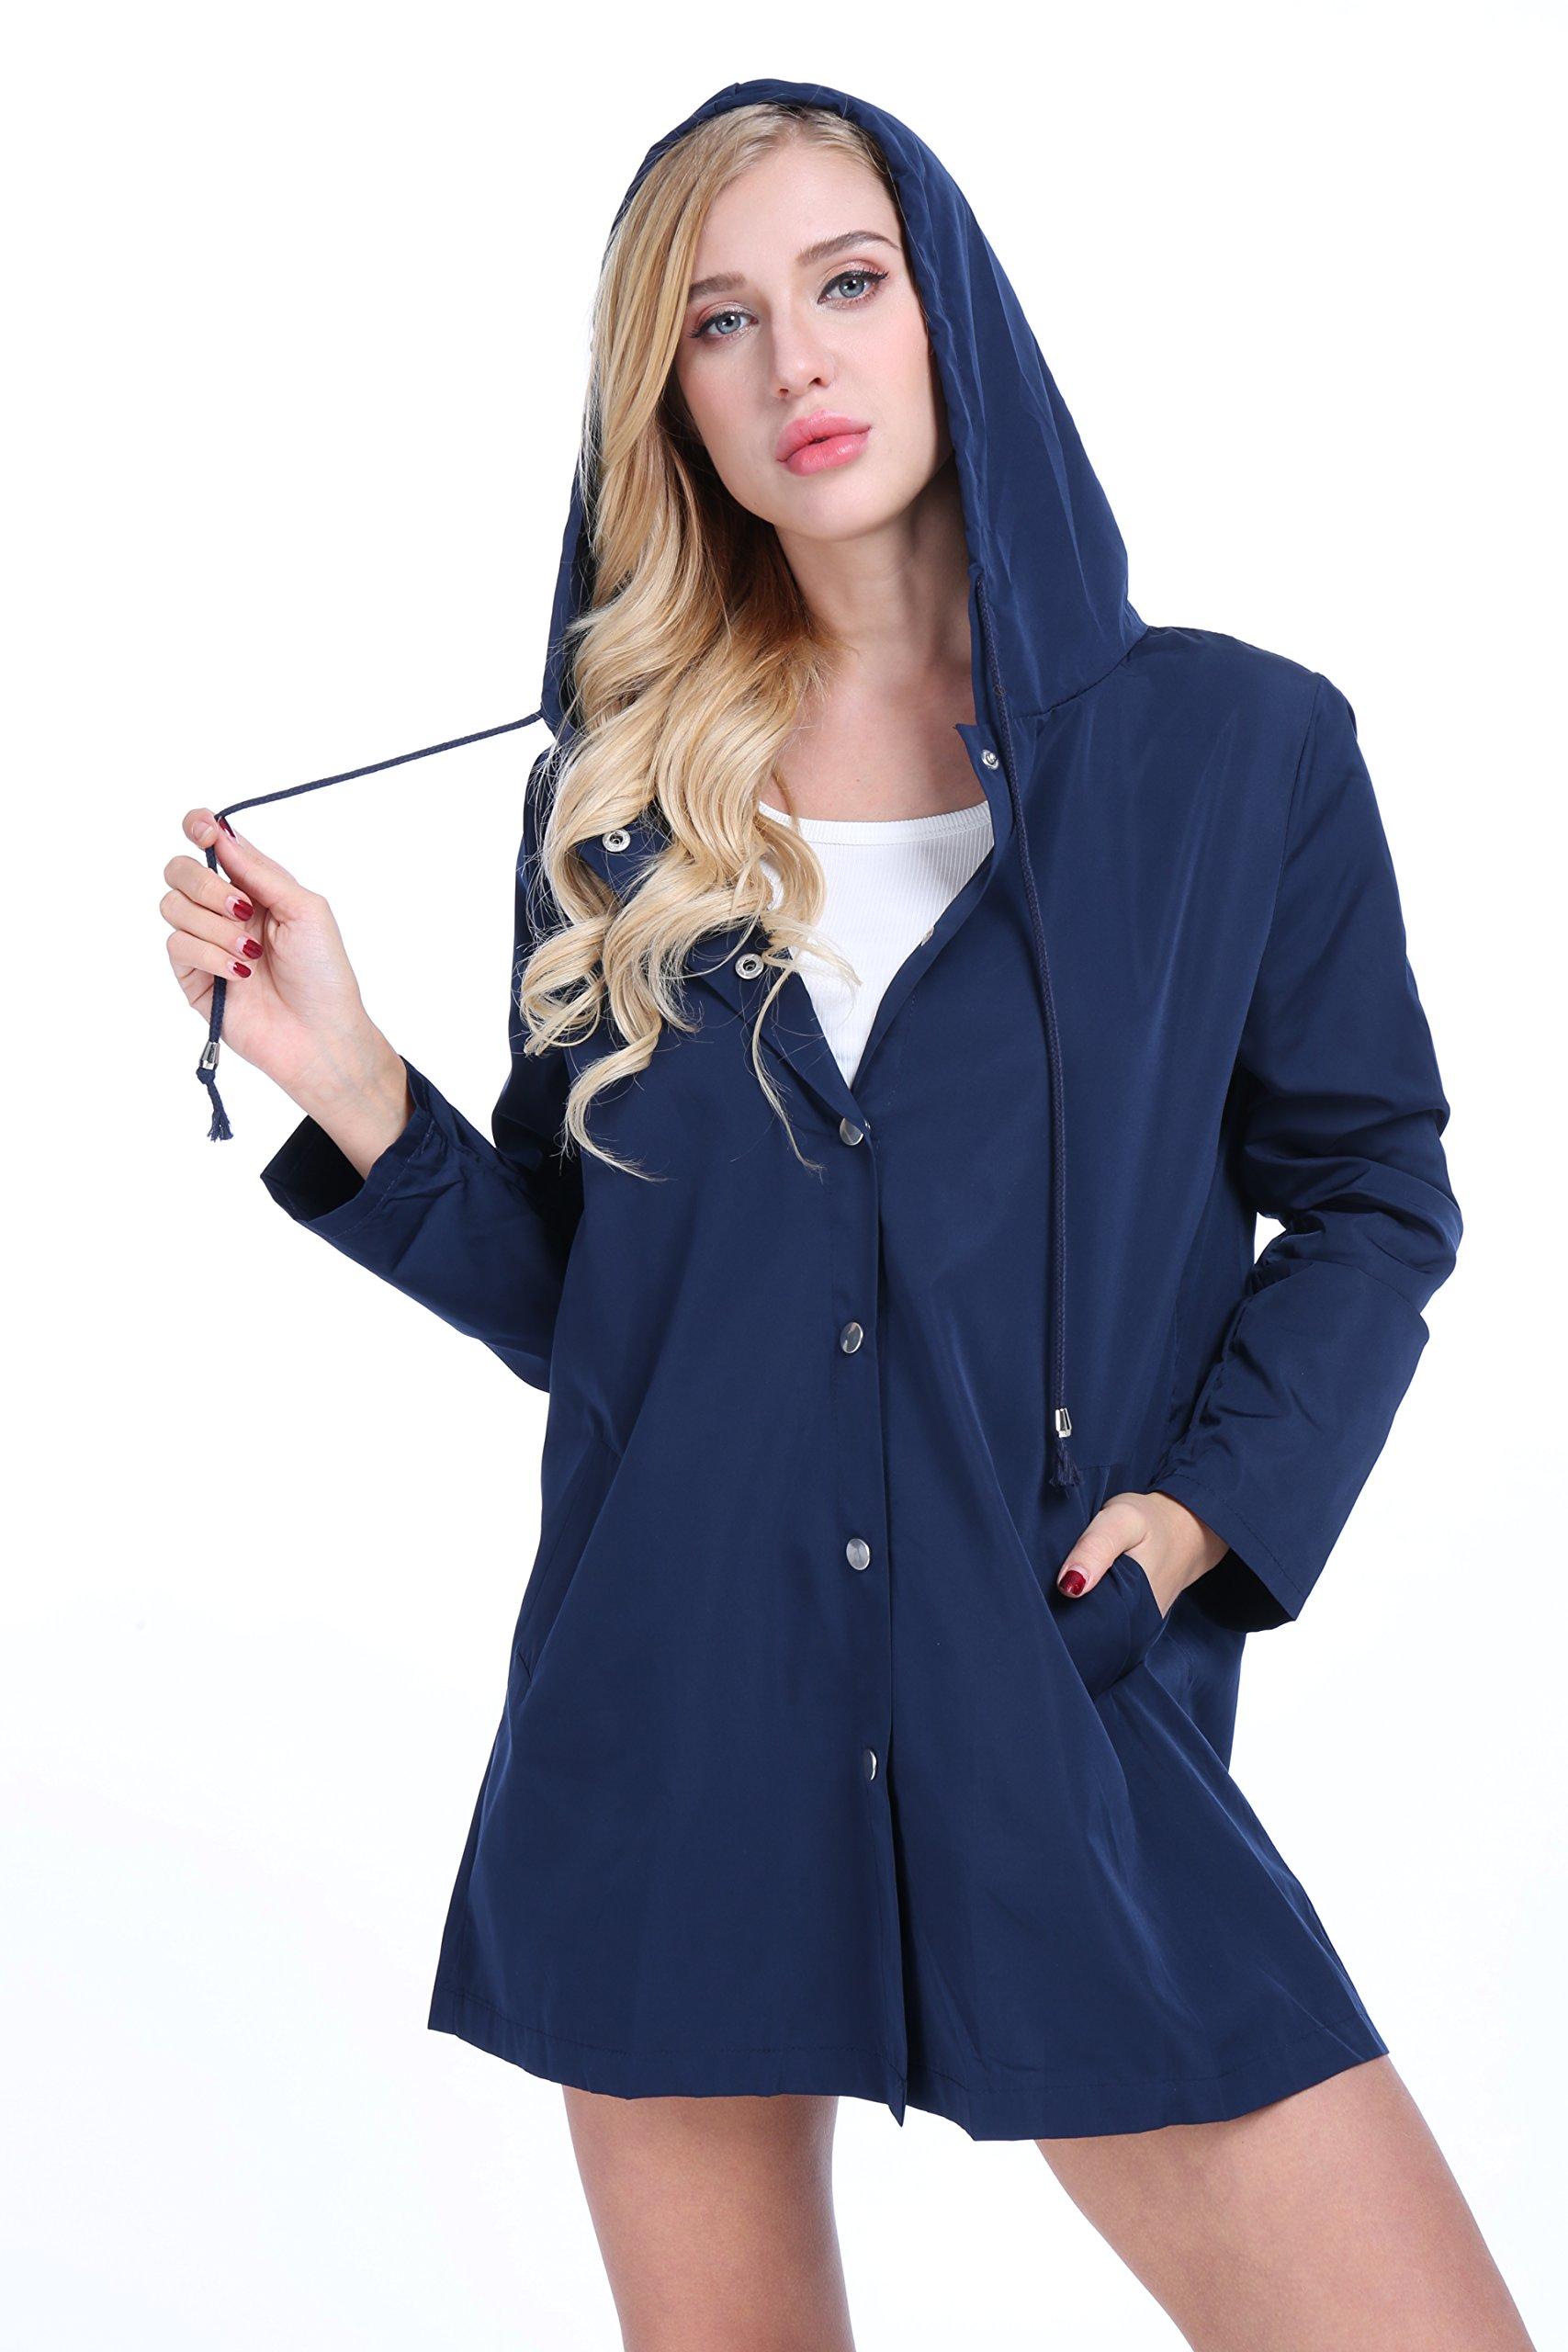 FISOUL Womens Raincoats Waterproof Lightweight Hooded Active Outdoor Rain Jacket